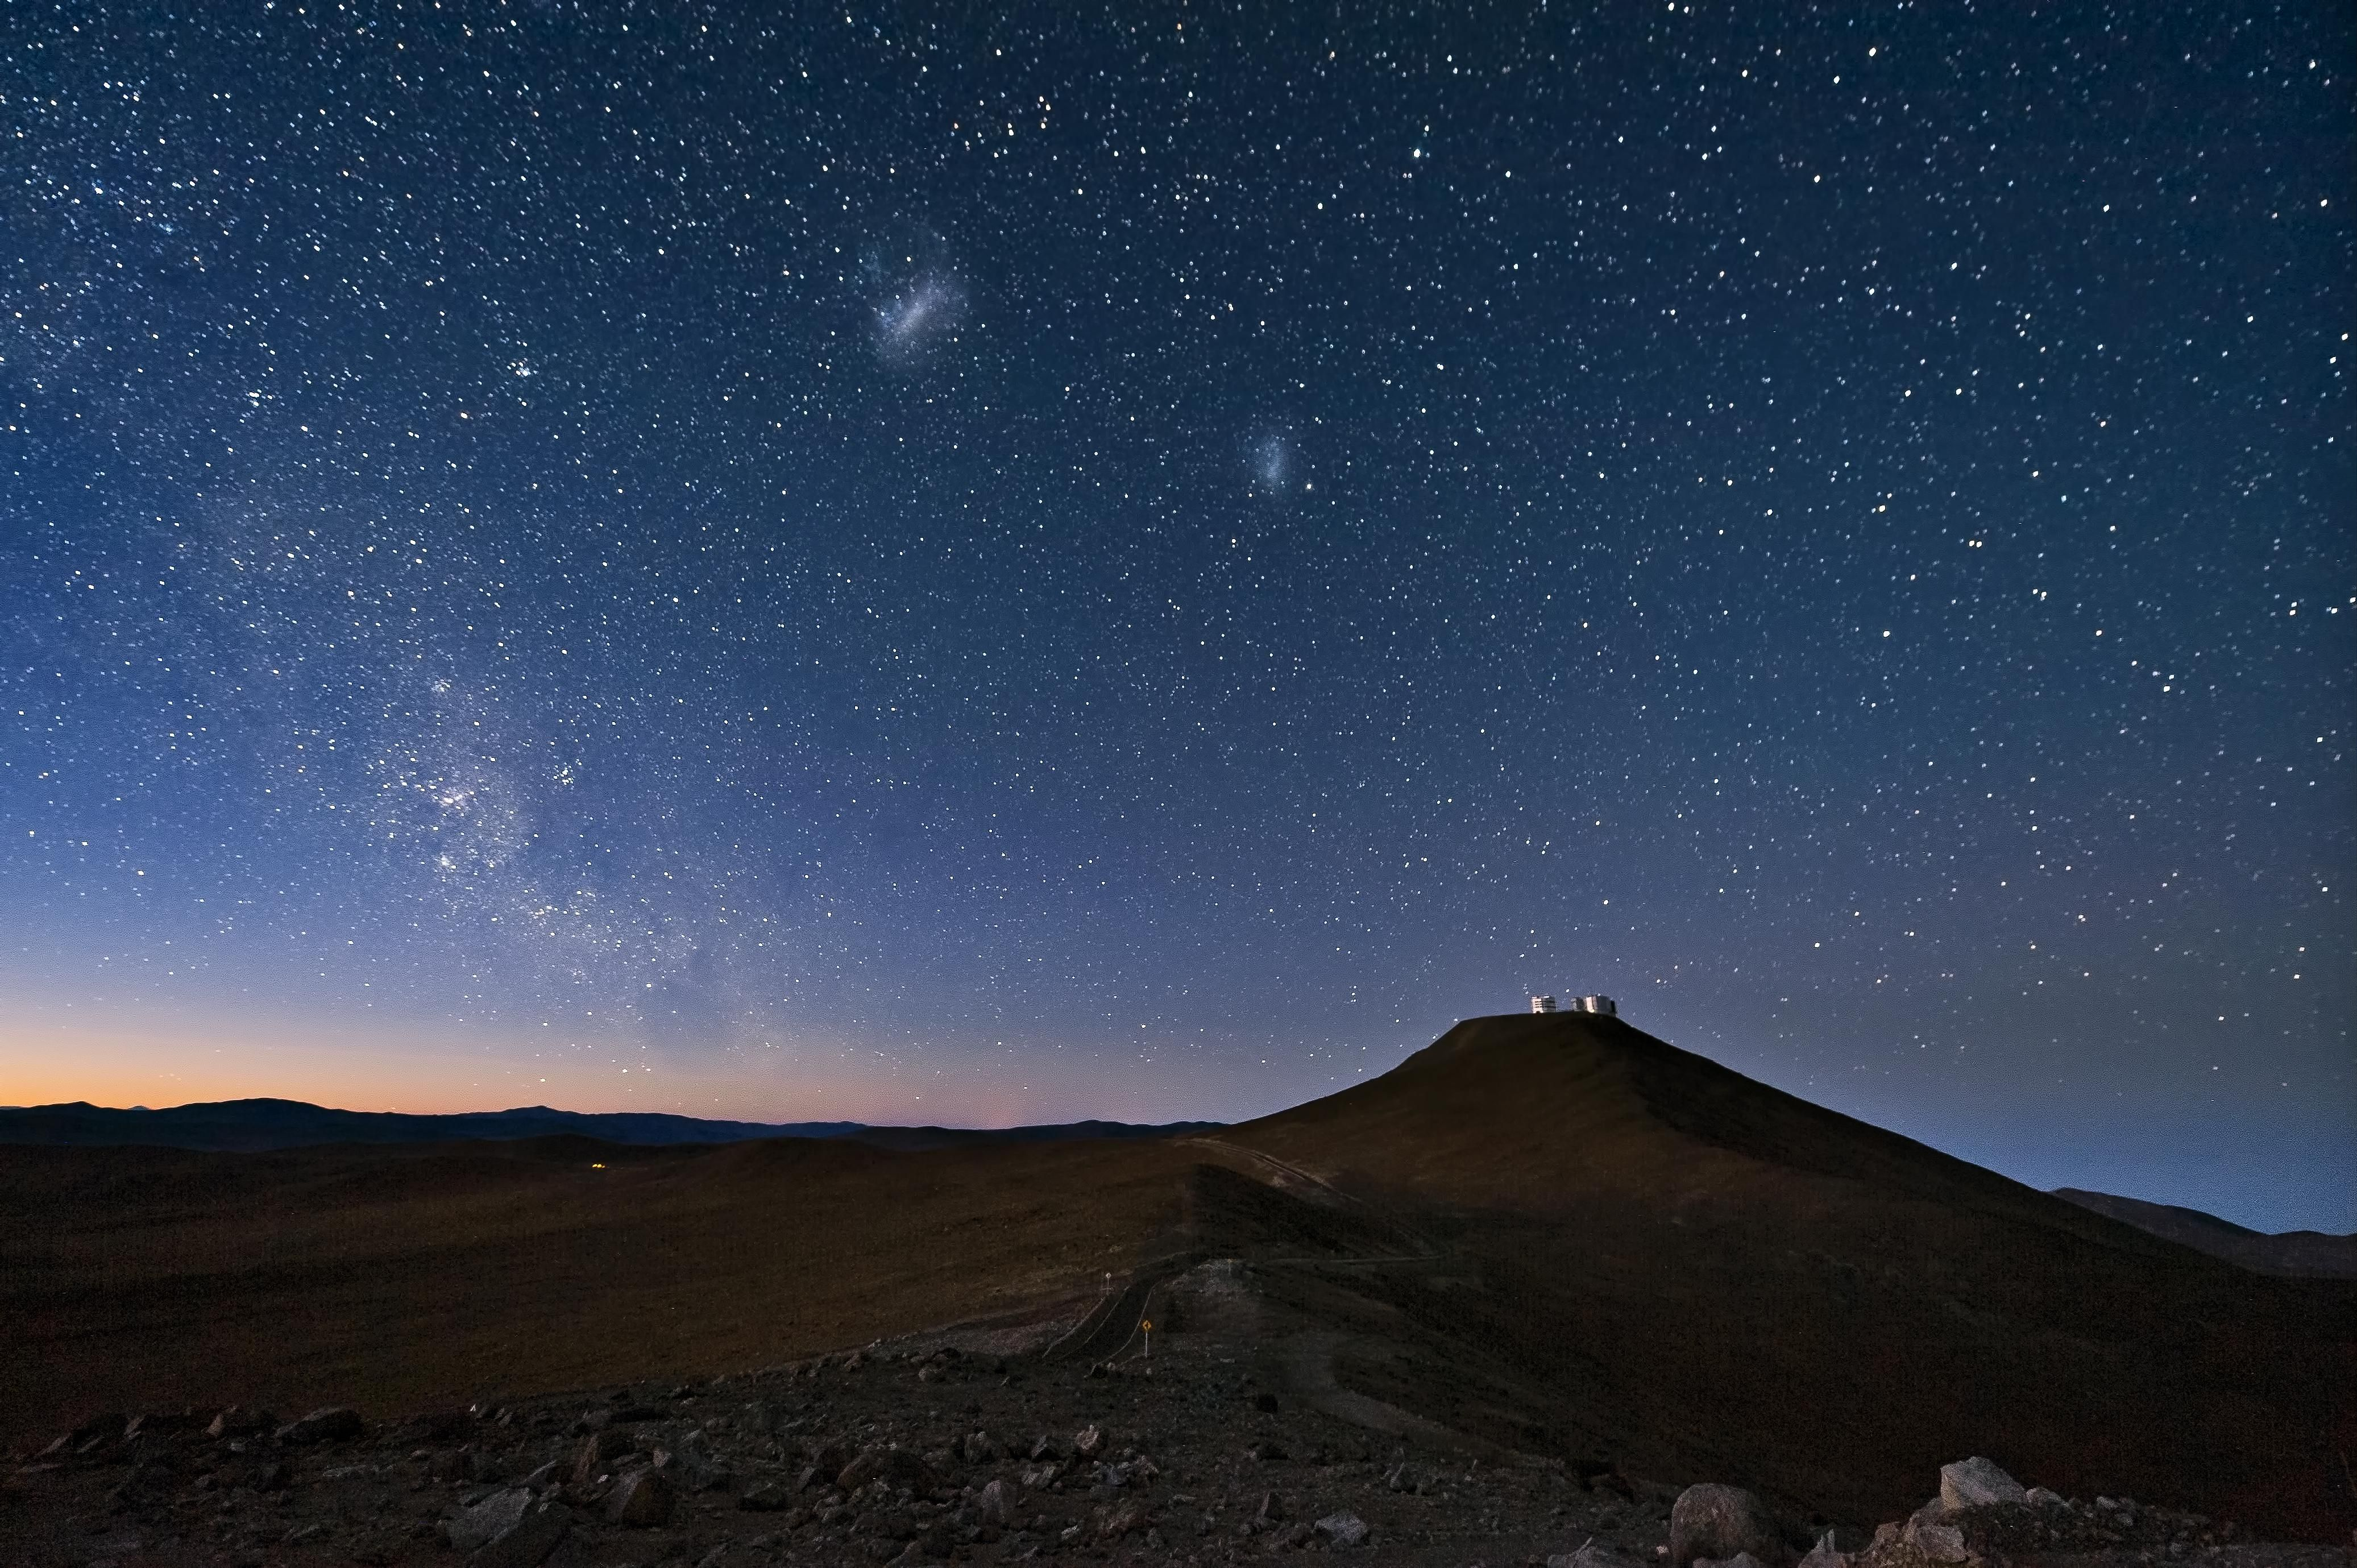 Arabian Night Sky Google Search Stargazing Desert Mountains Mountains